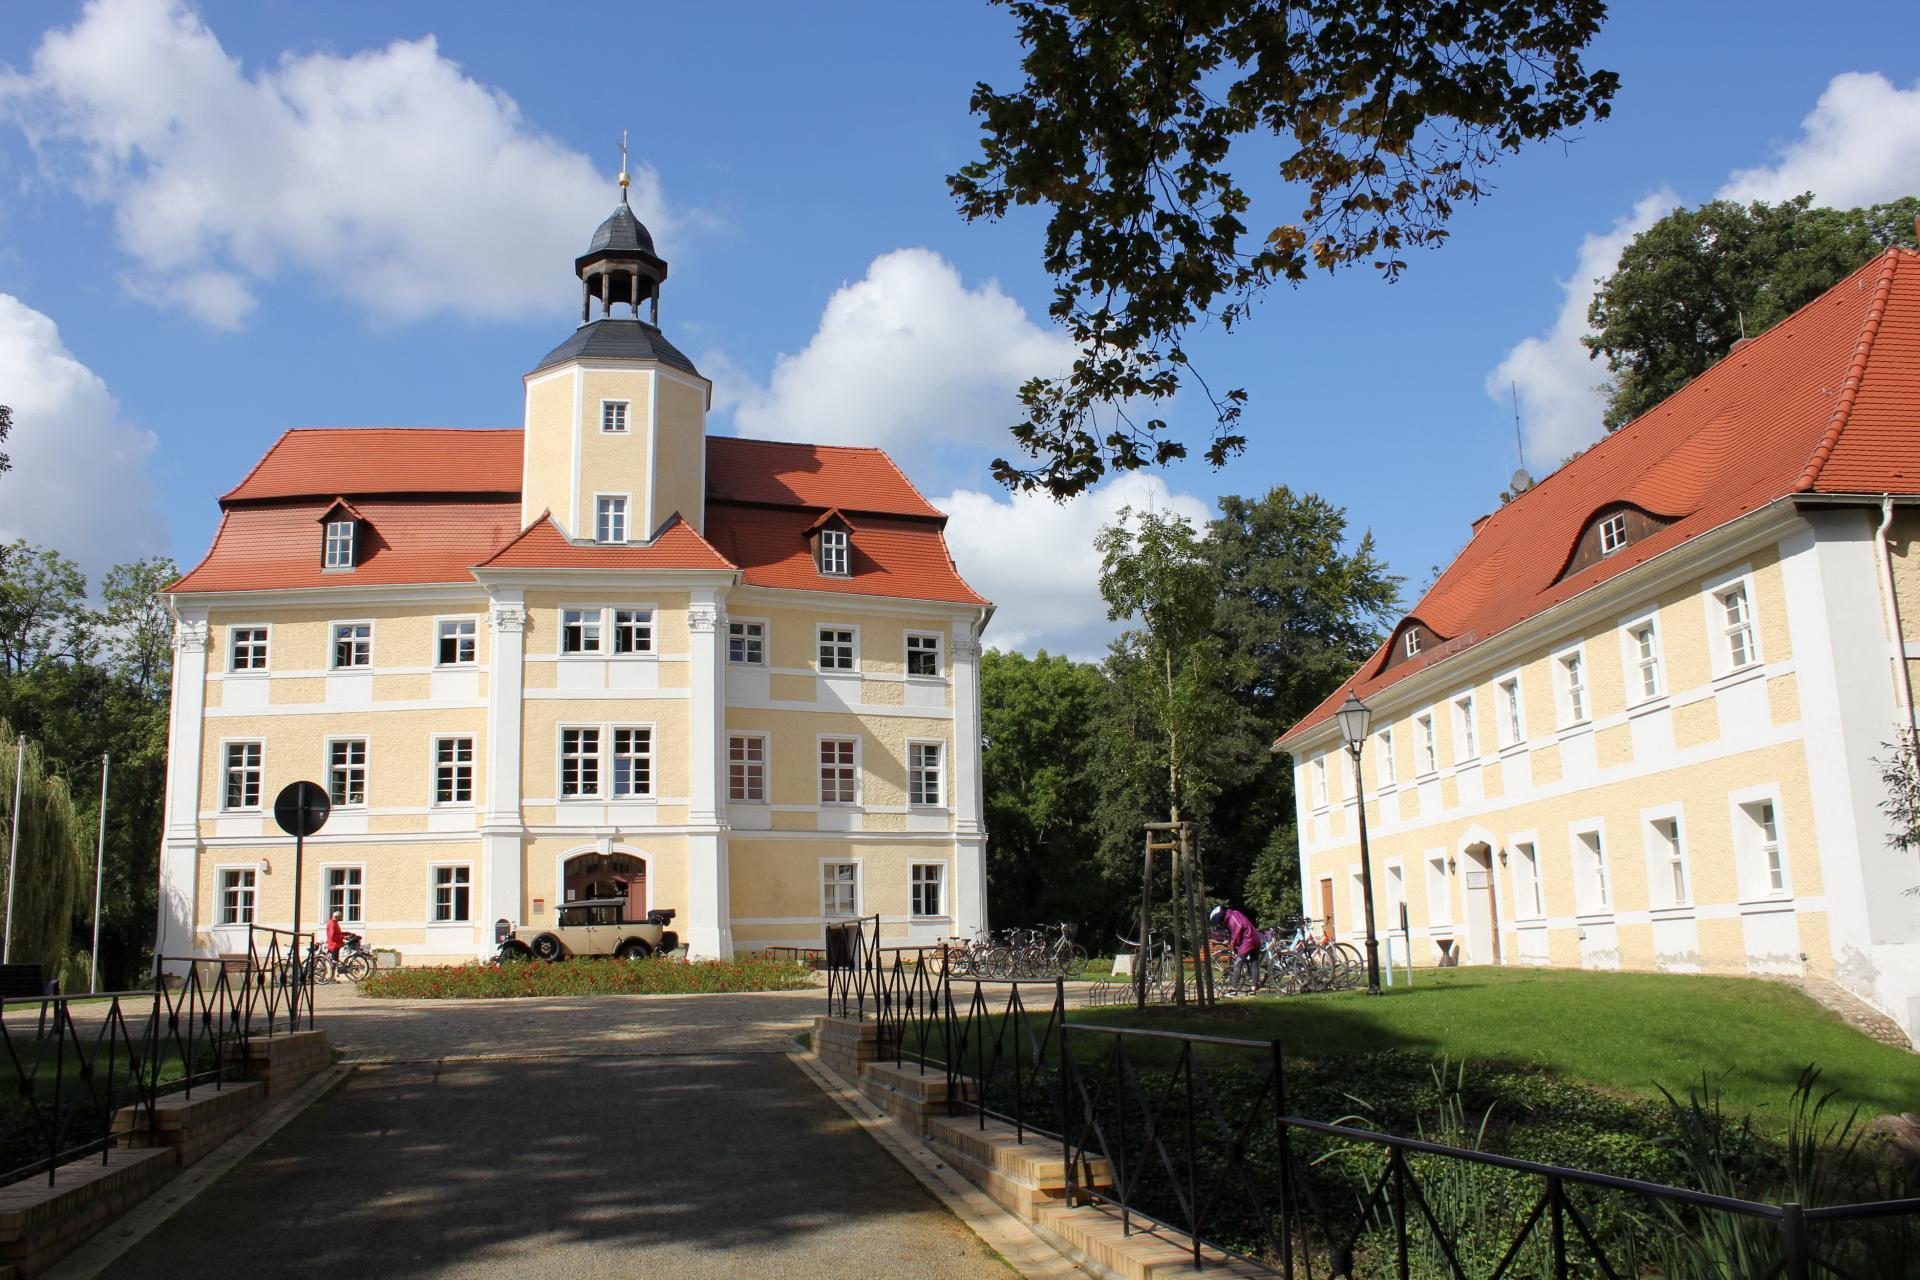 Stadtschloss Vetschau/Spreewald, Quelle Stadt Lübbenau/Spreewald